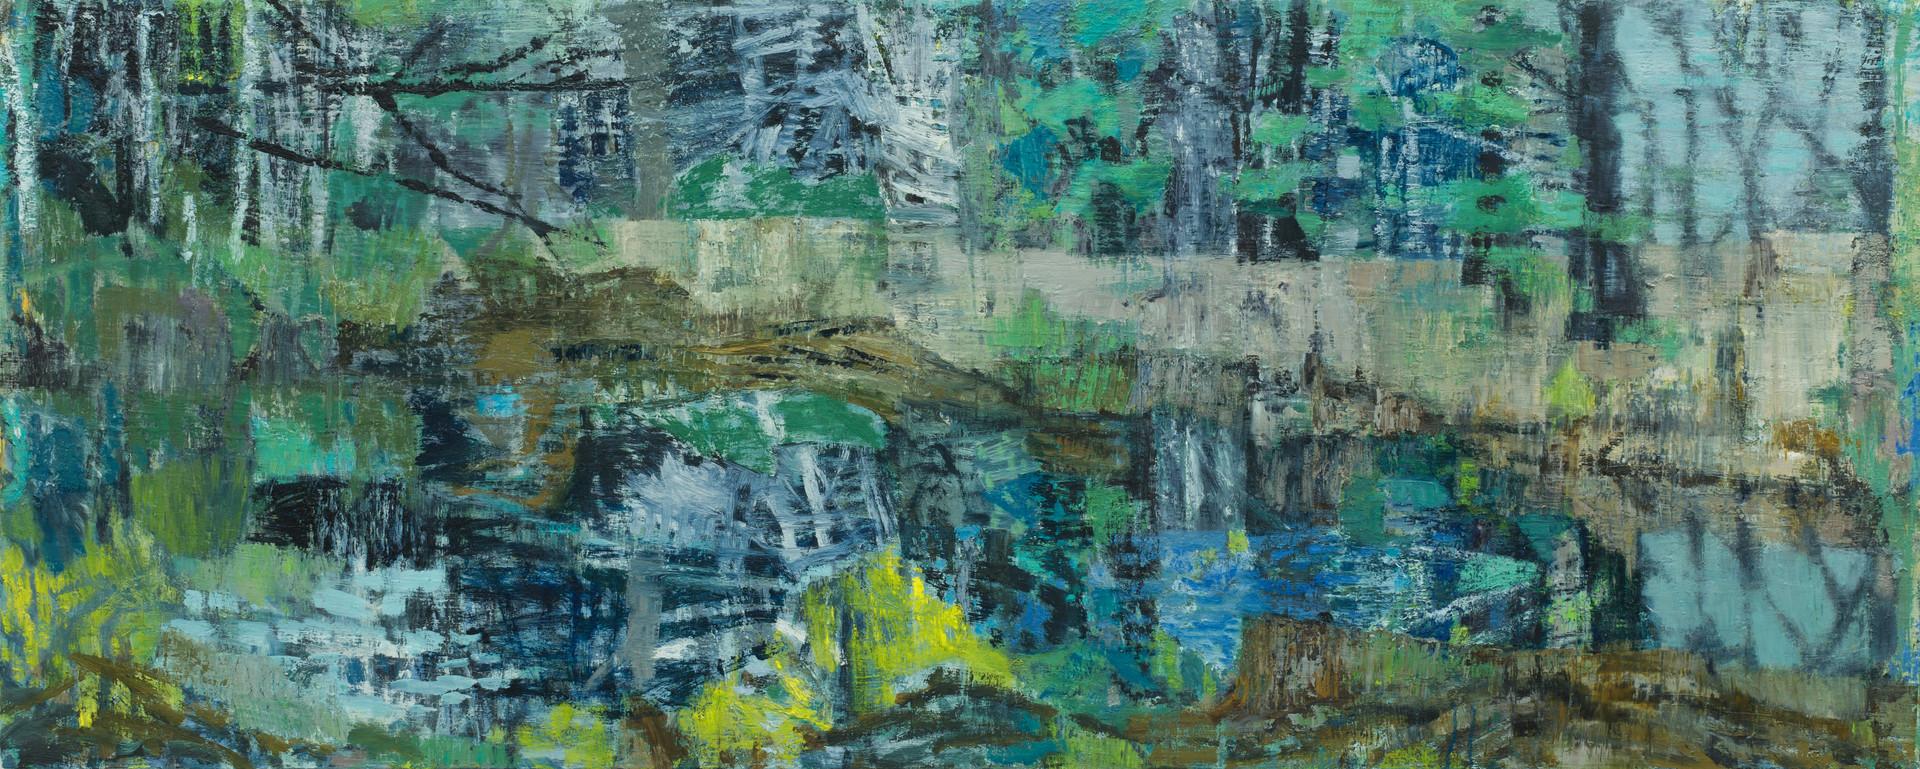 Blue forest pool 2019  oil on linen 80 x 200cm